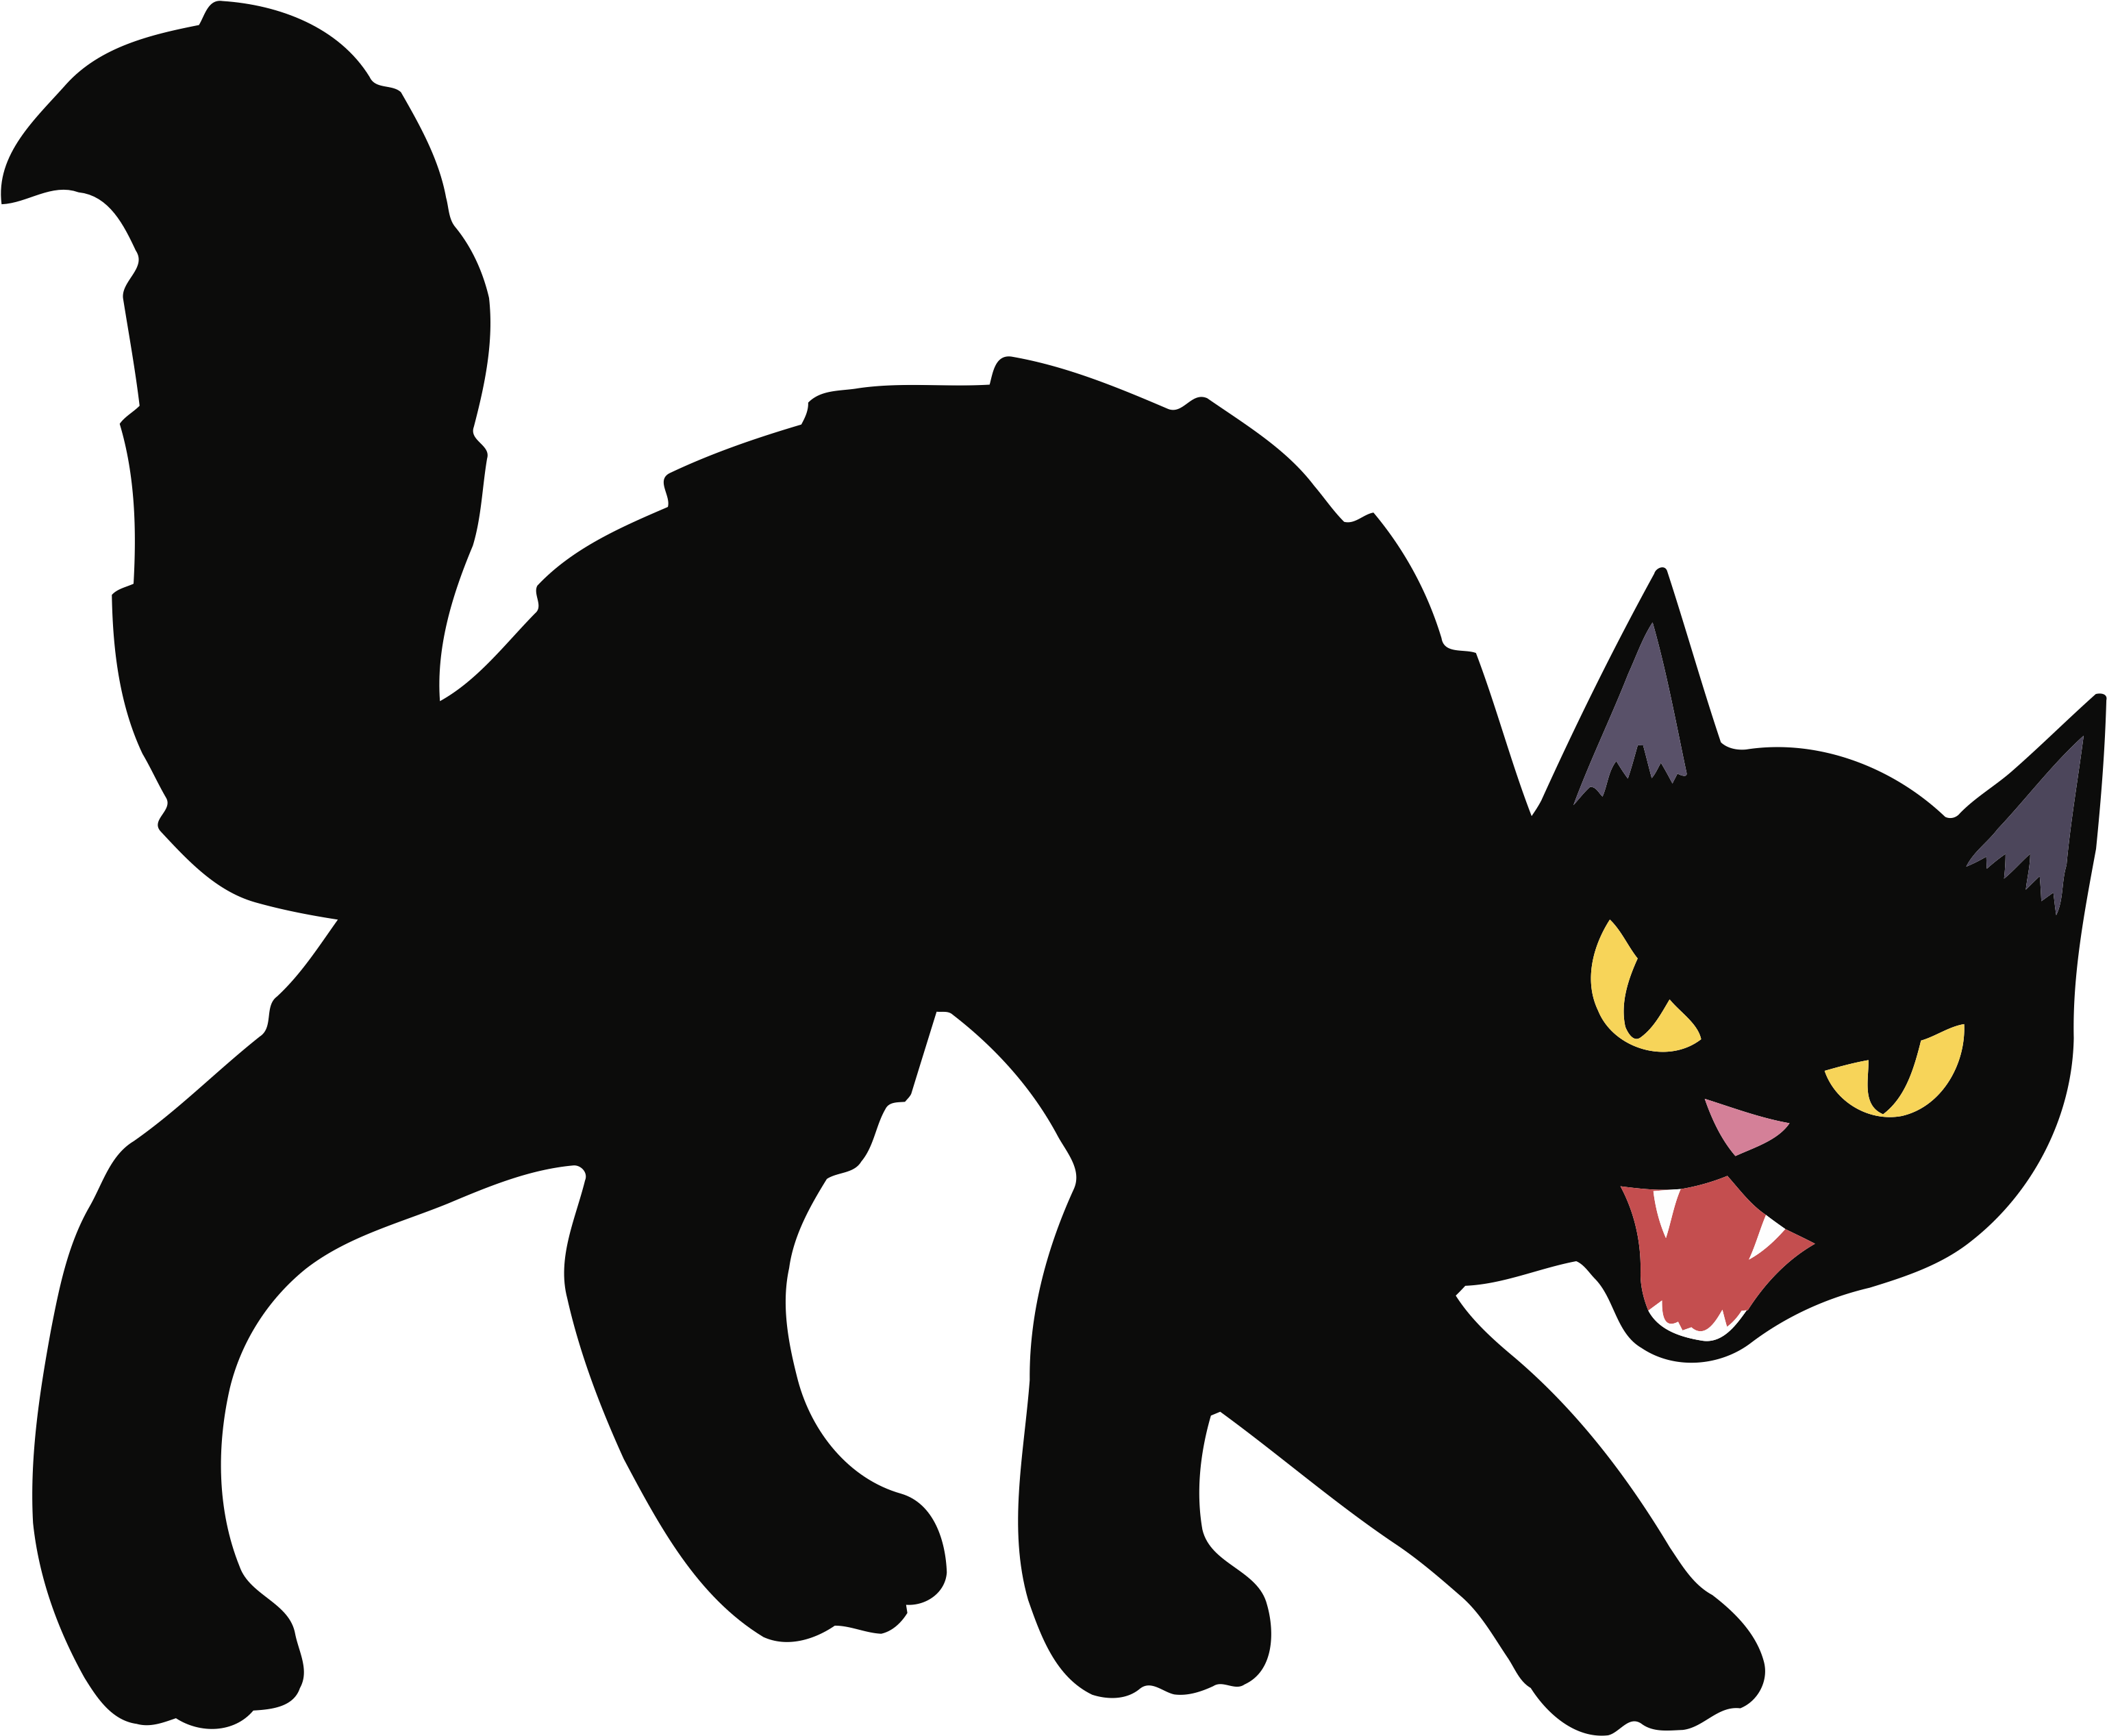 Transparent halloween black cat clip art - Black Cat Kitten Halloween Clip Art - Scary Halloween Black Cat